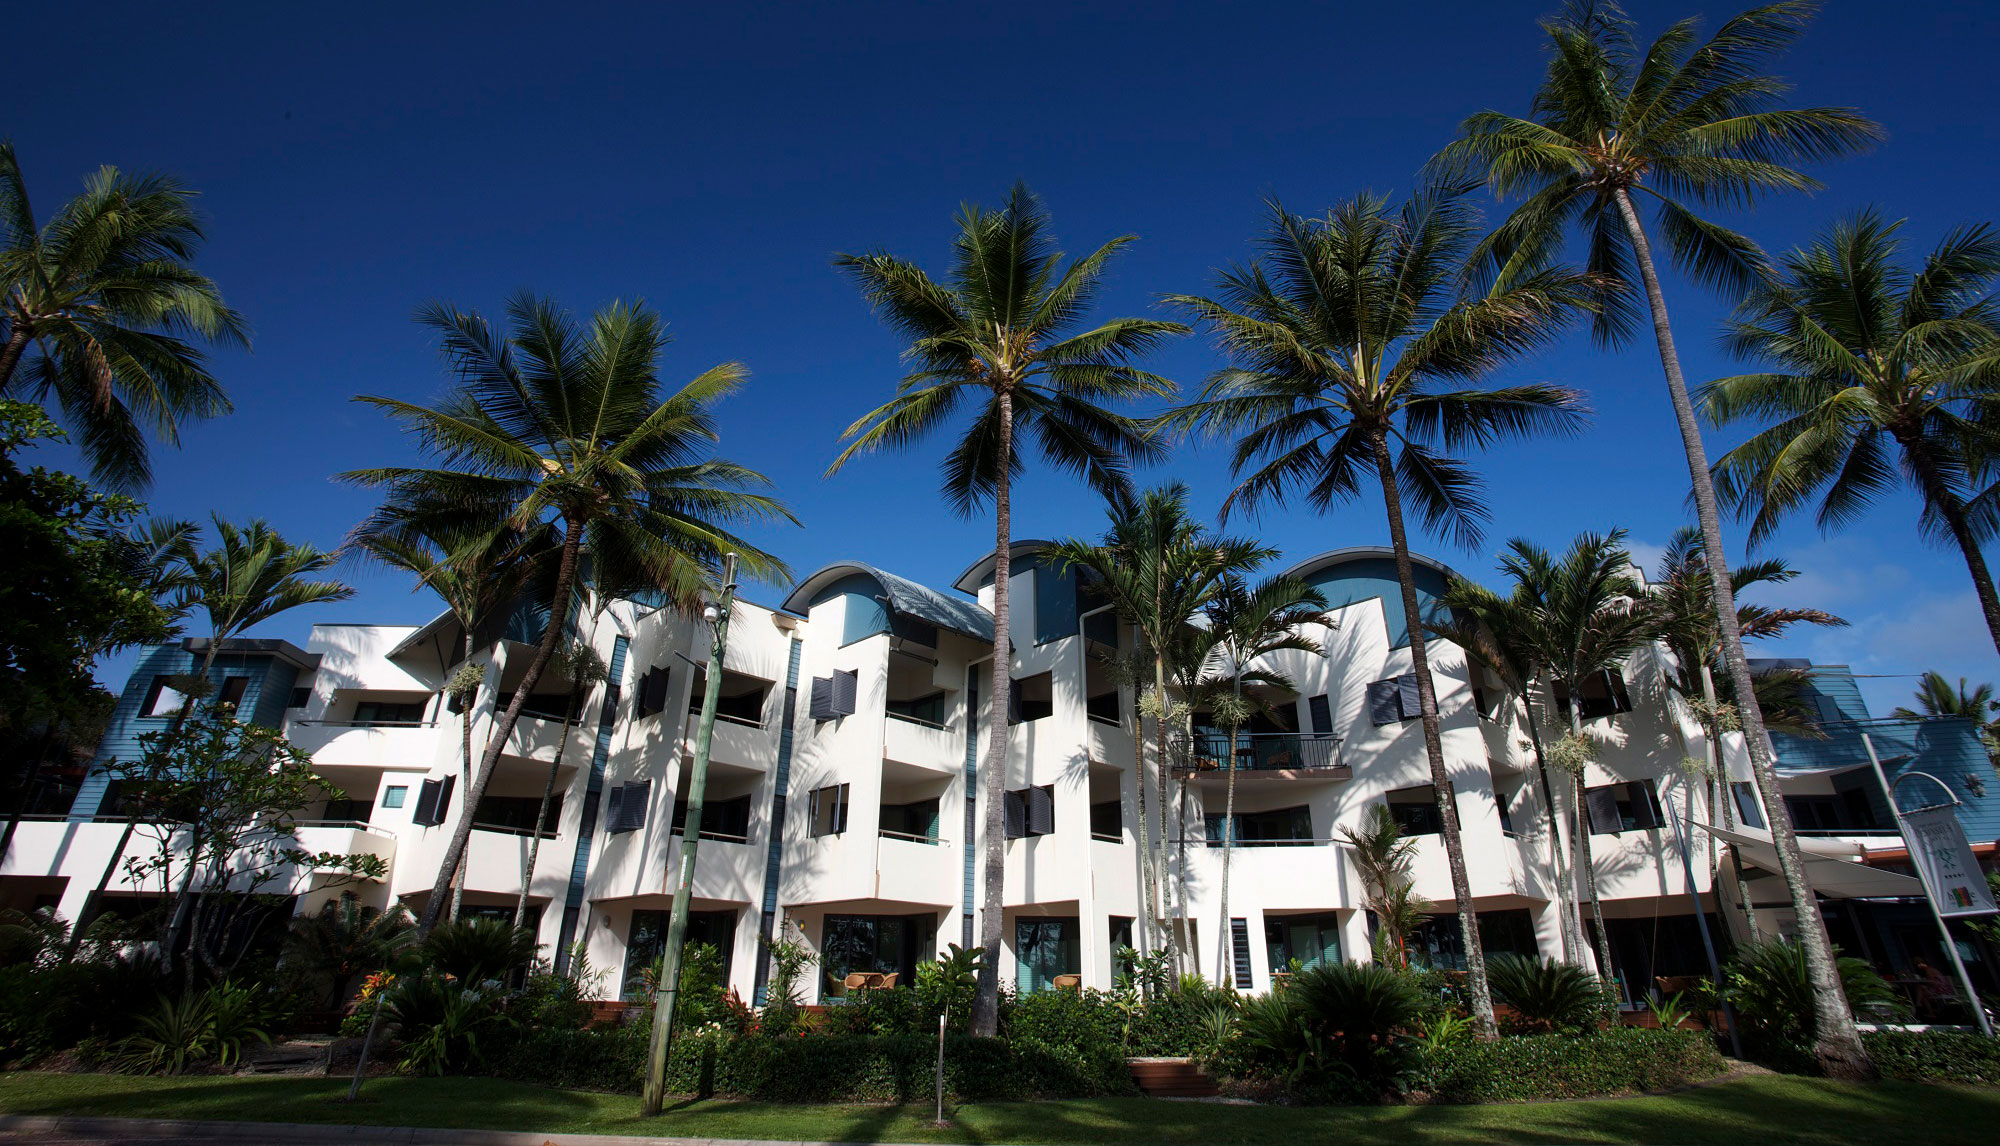 Peninsula-Hotel-TPG-Architects-from-Peninsula-Website.jpg